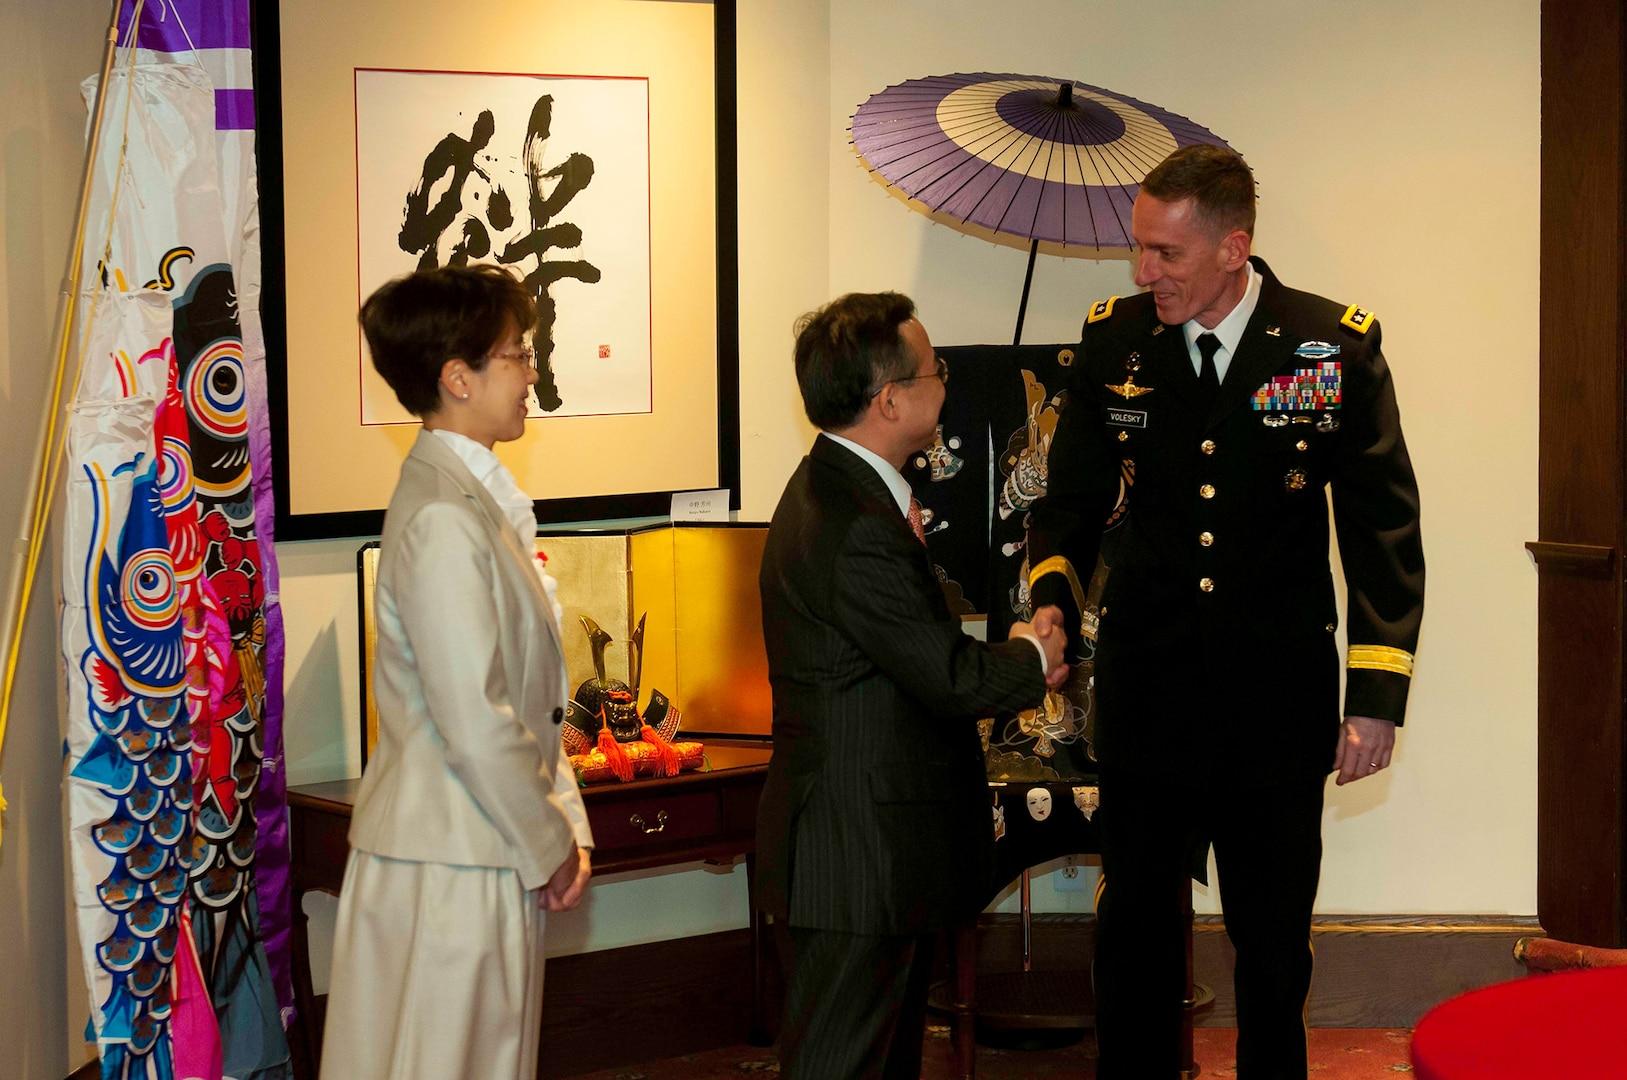 JBLM Senior leaders meet with Consulate General of Japan in Seattle